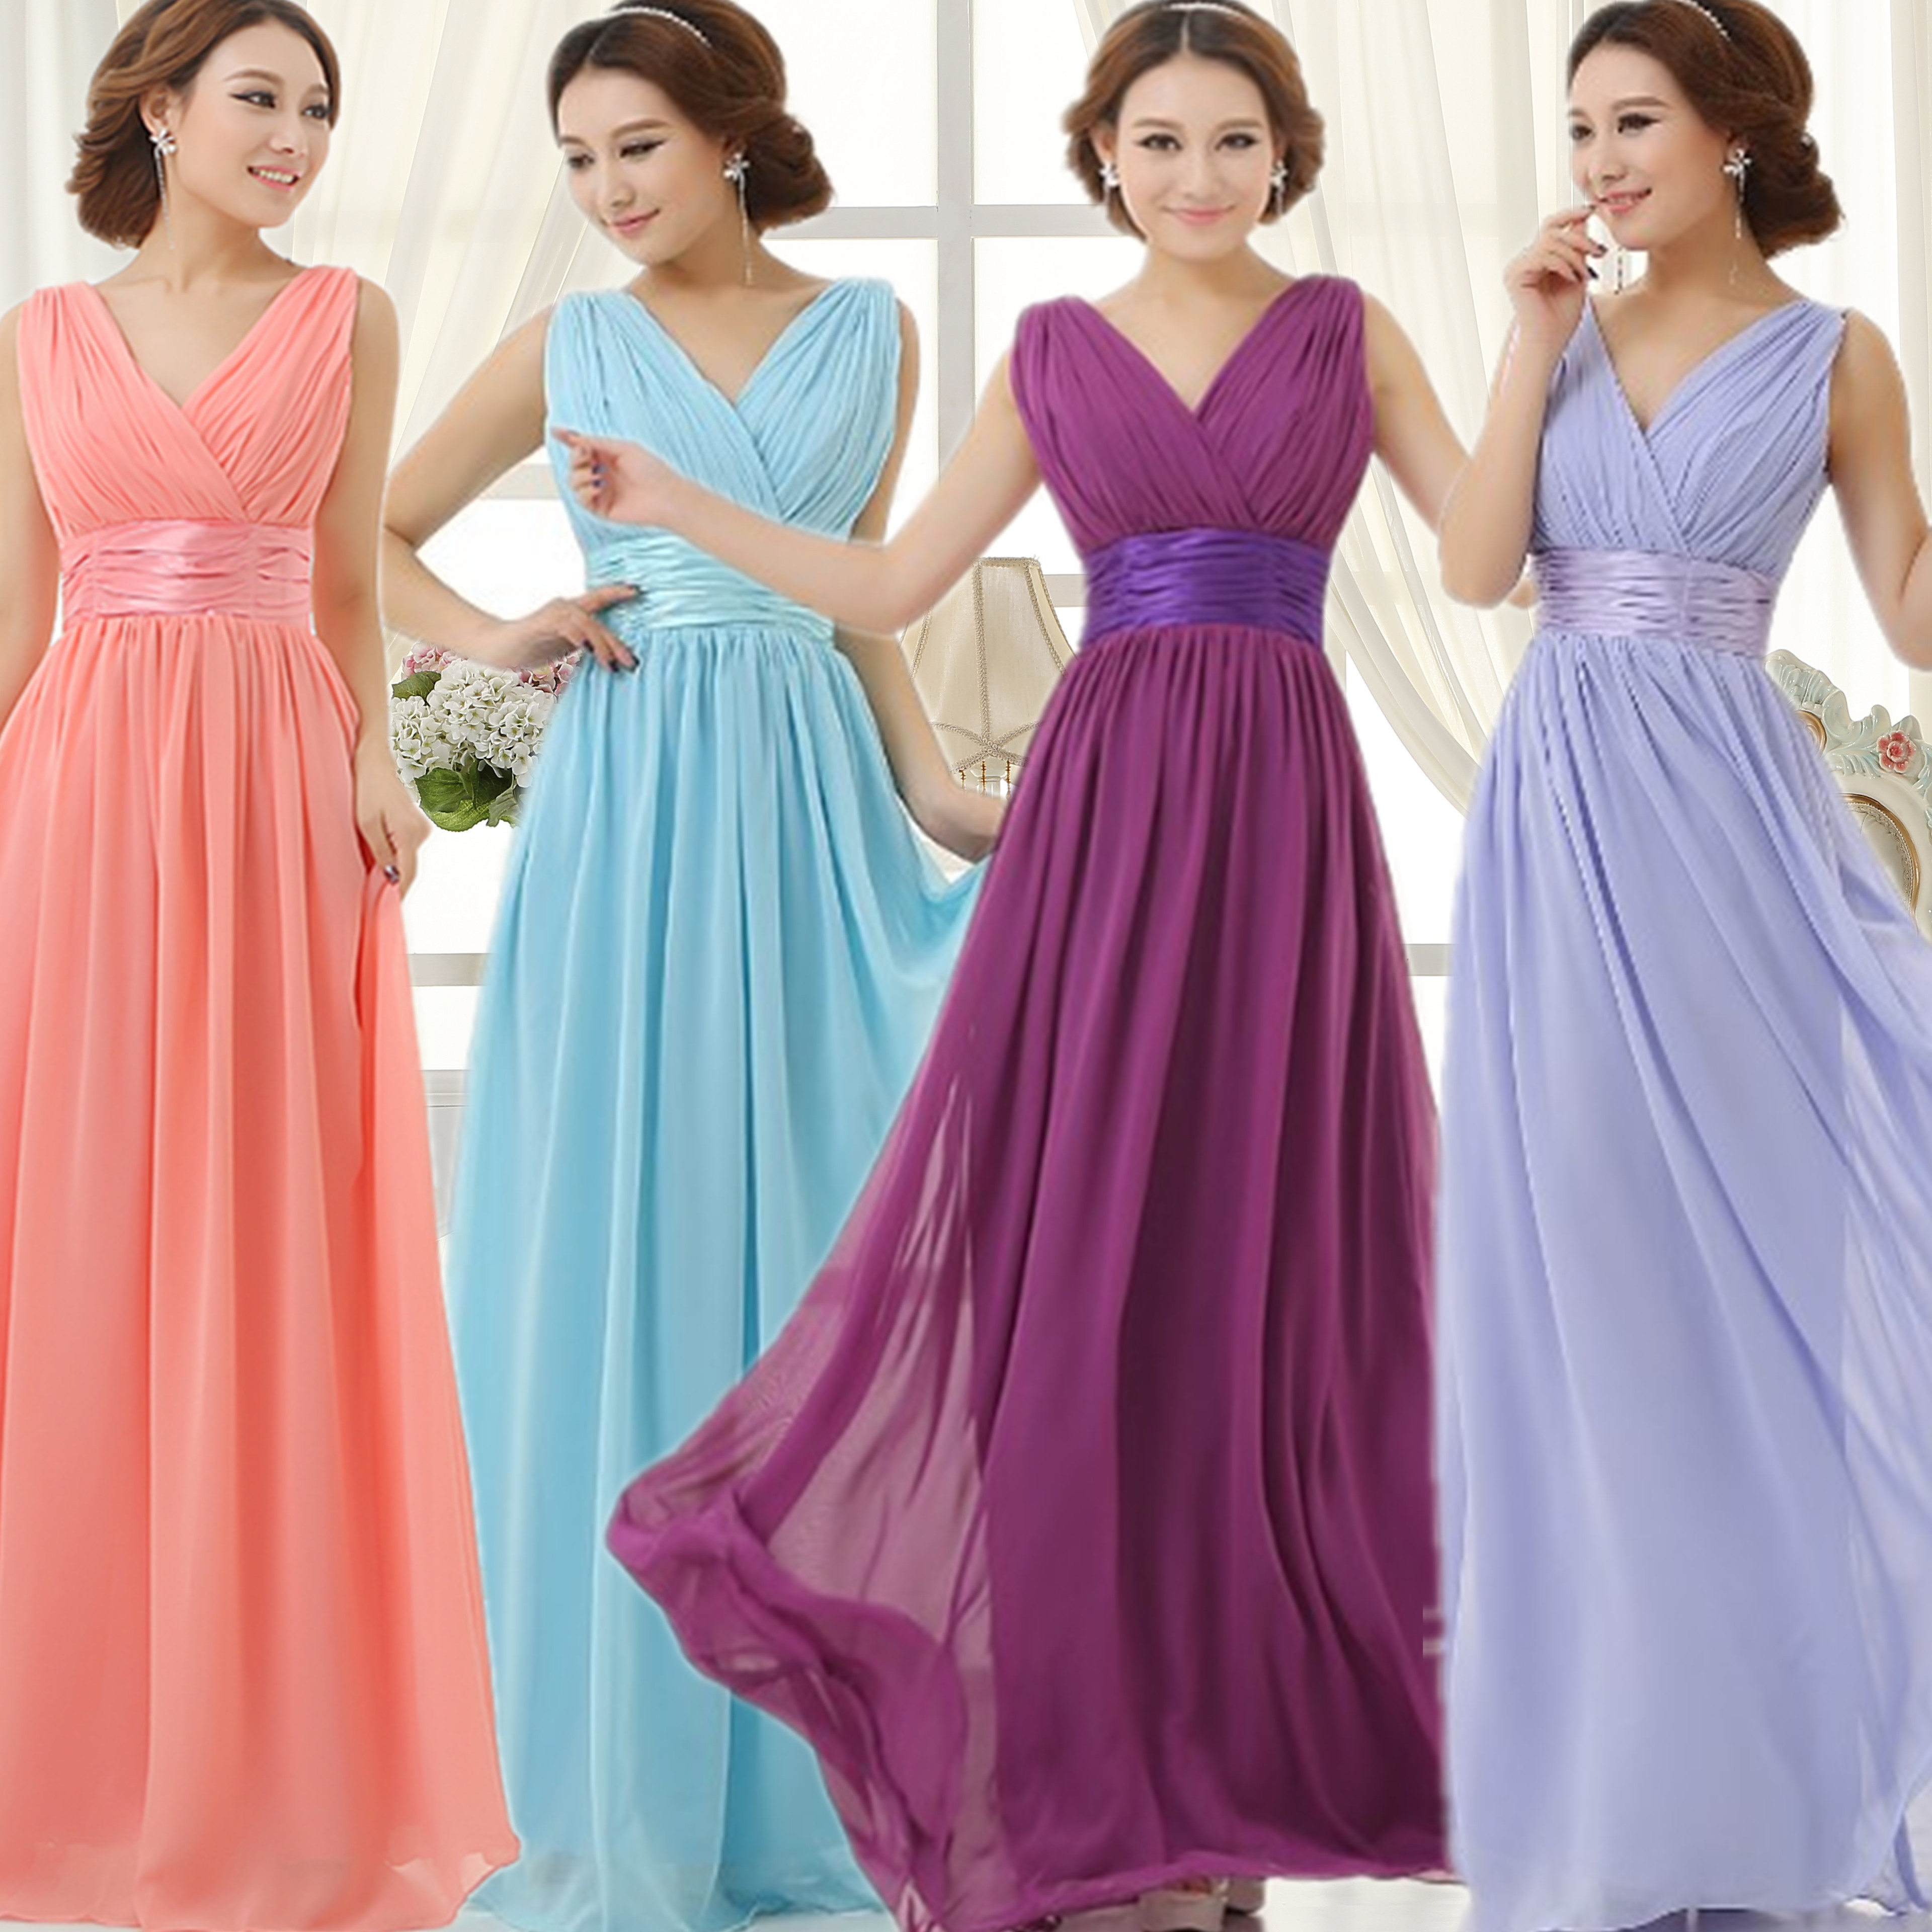 royal light uncategorized font and bridesmaid b long lighting pink yellow blue purple dresses cheap dress sky images